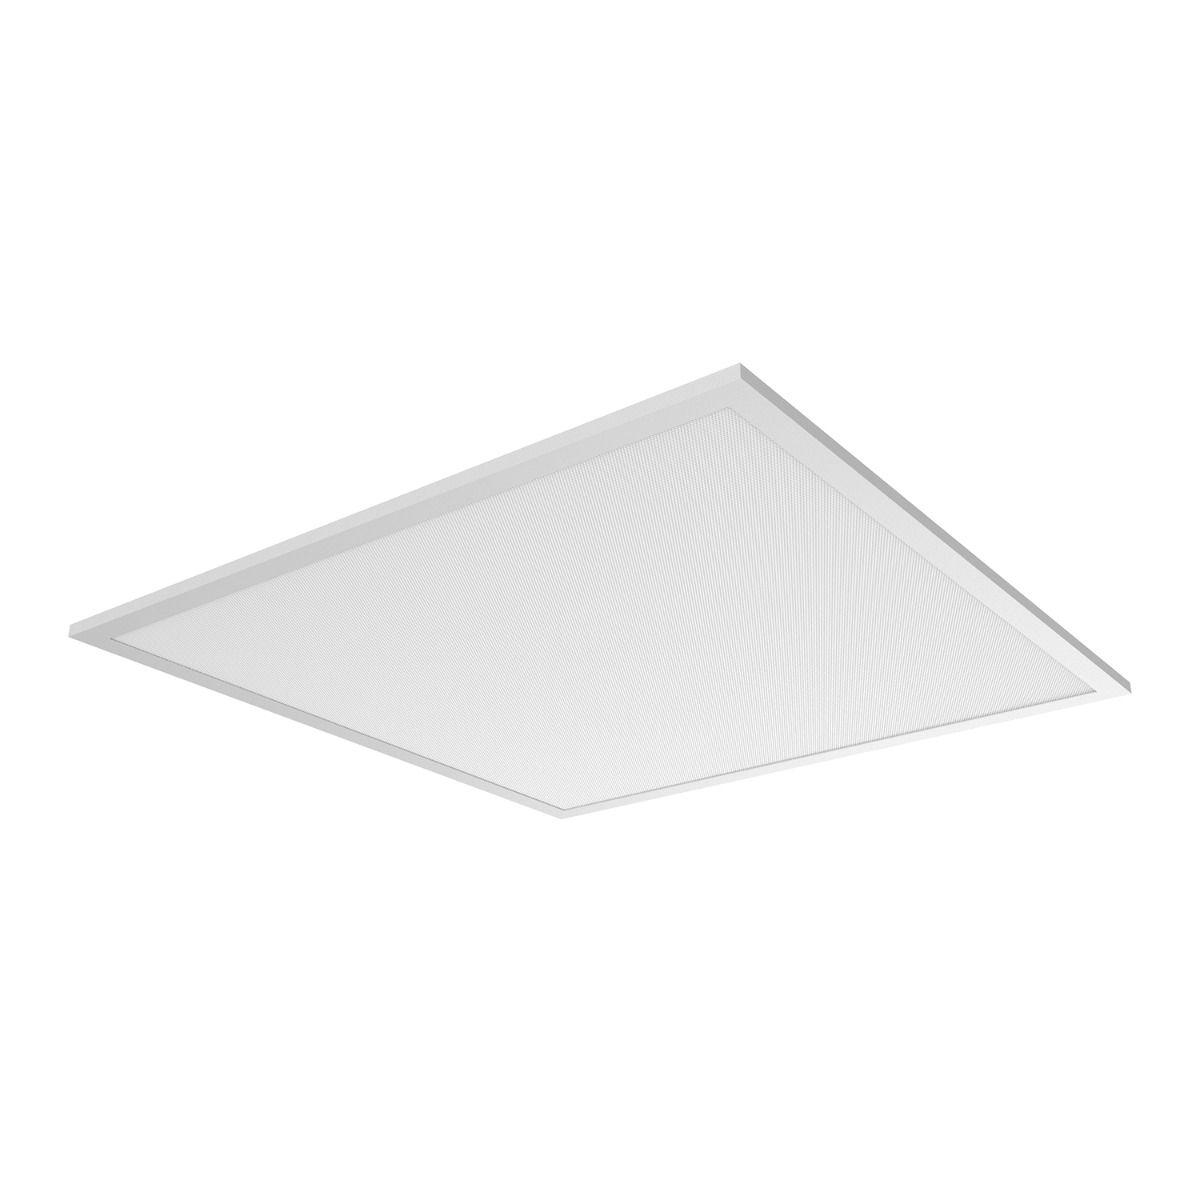 Noxion Panel LED Delta Pro V3 30W 4000K 4070lm 60x60cm UGR <19   Blanco Frio - Reemplazo 4x18W